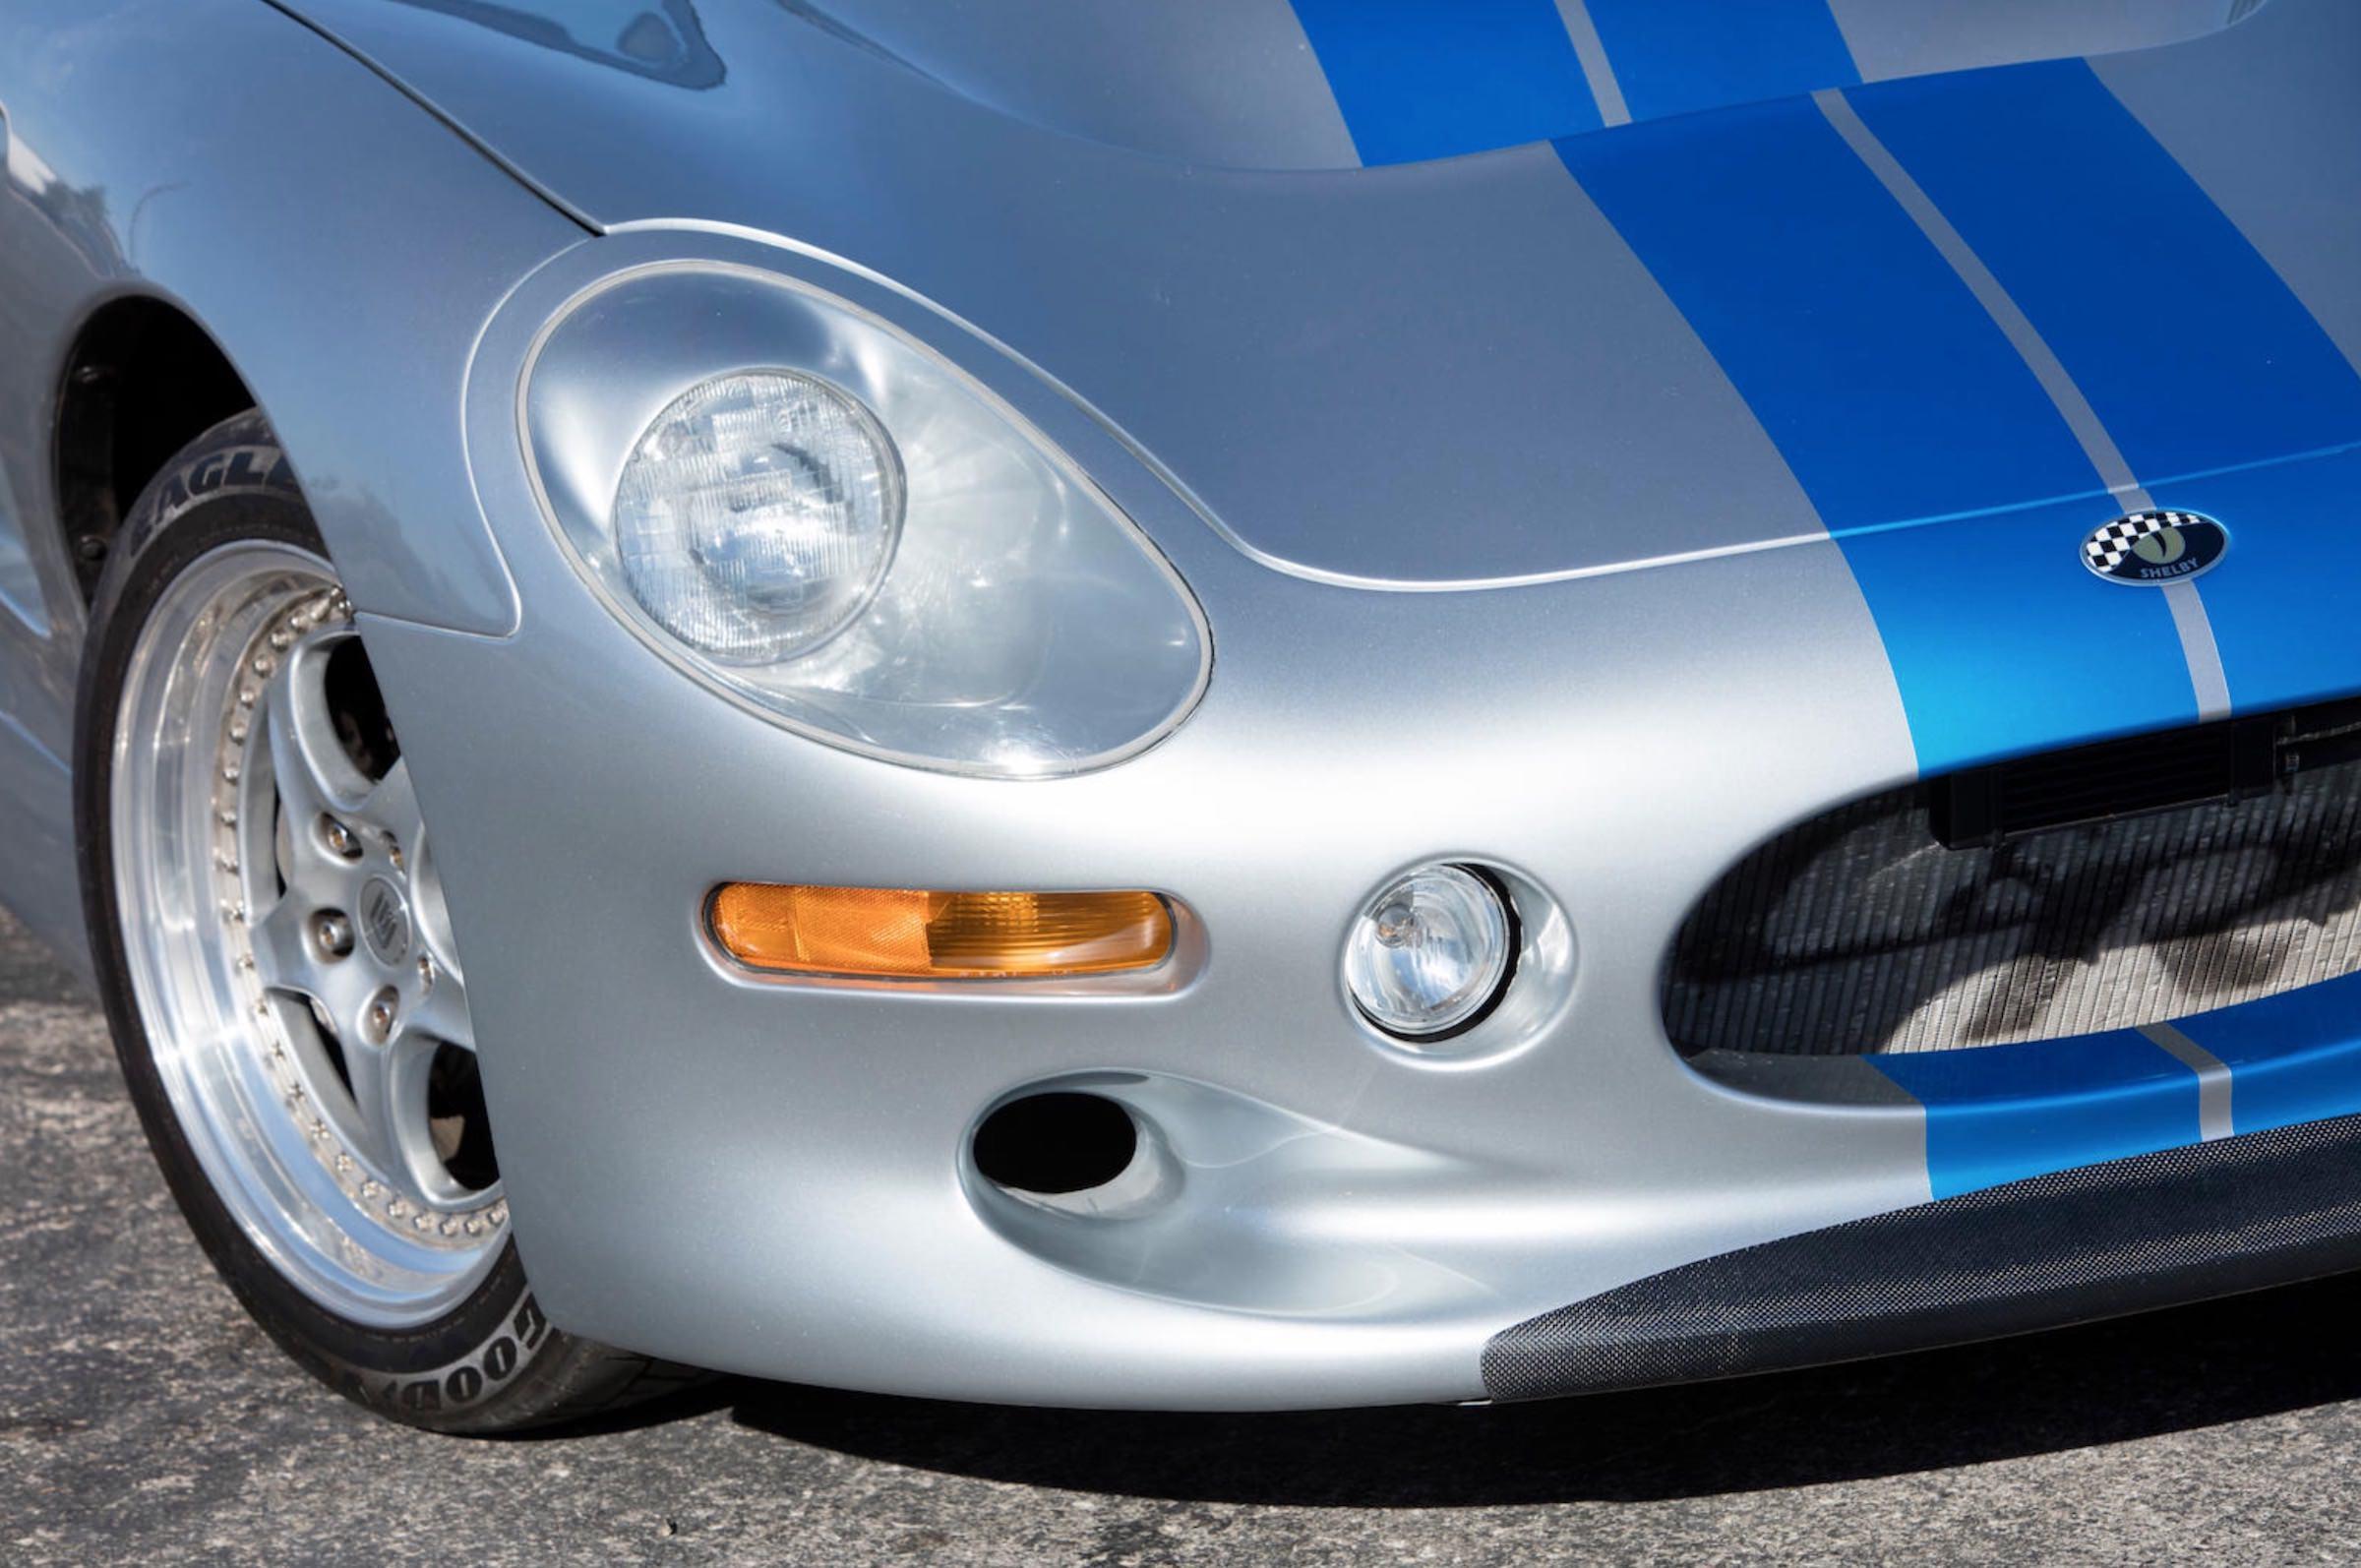 Shelby Series 1 Headlight